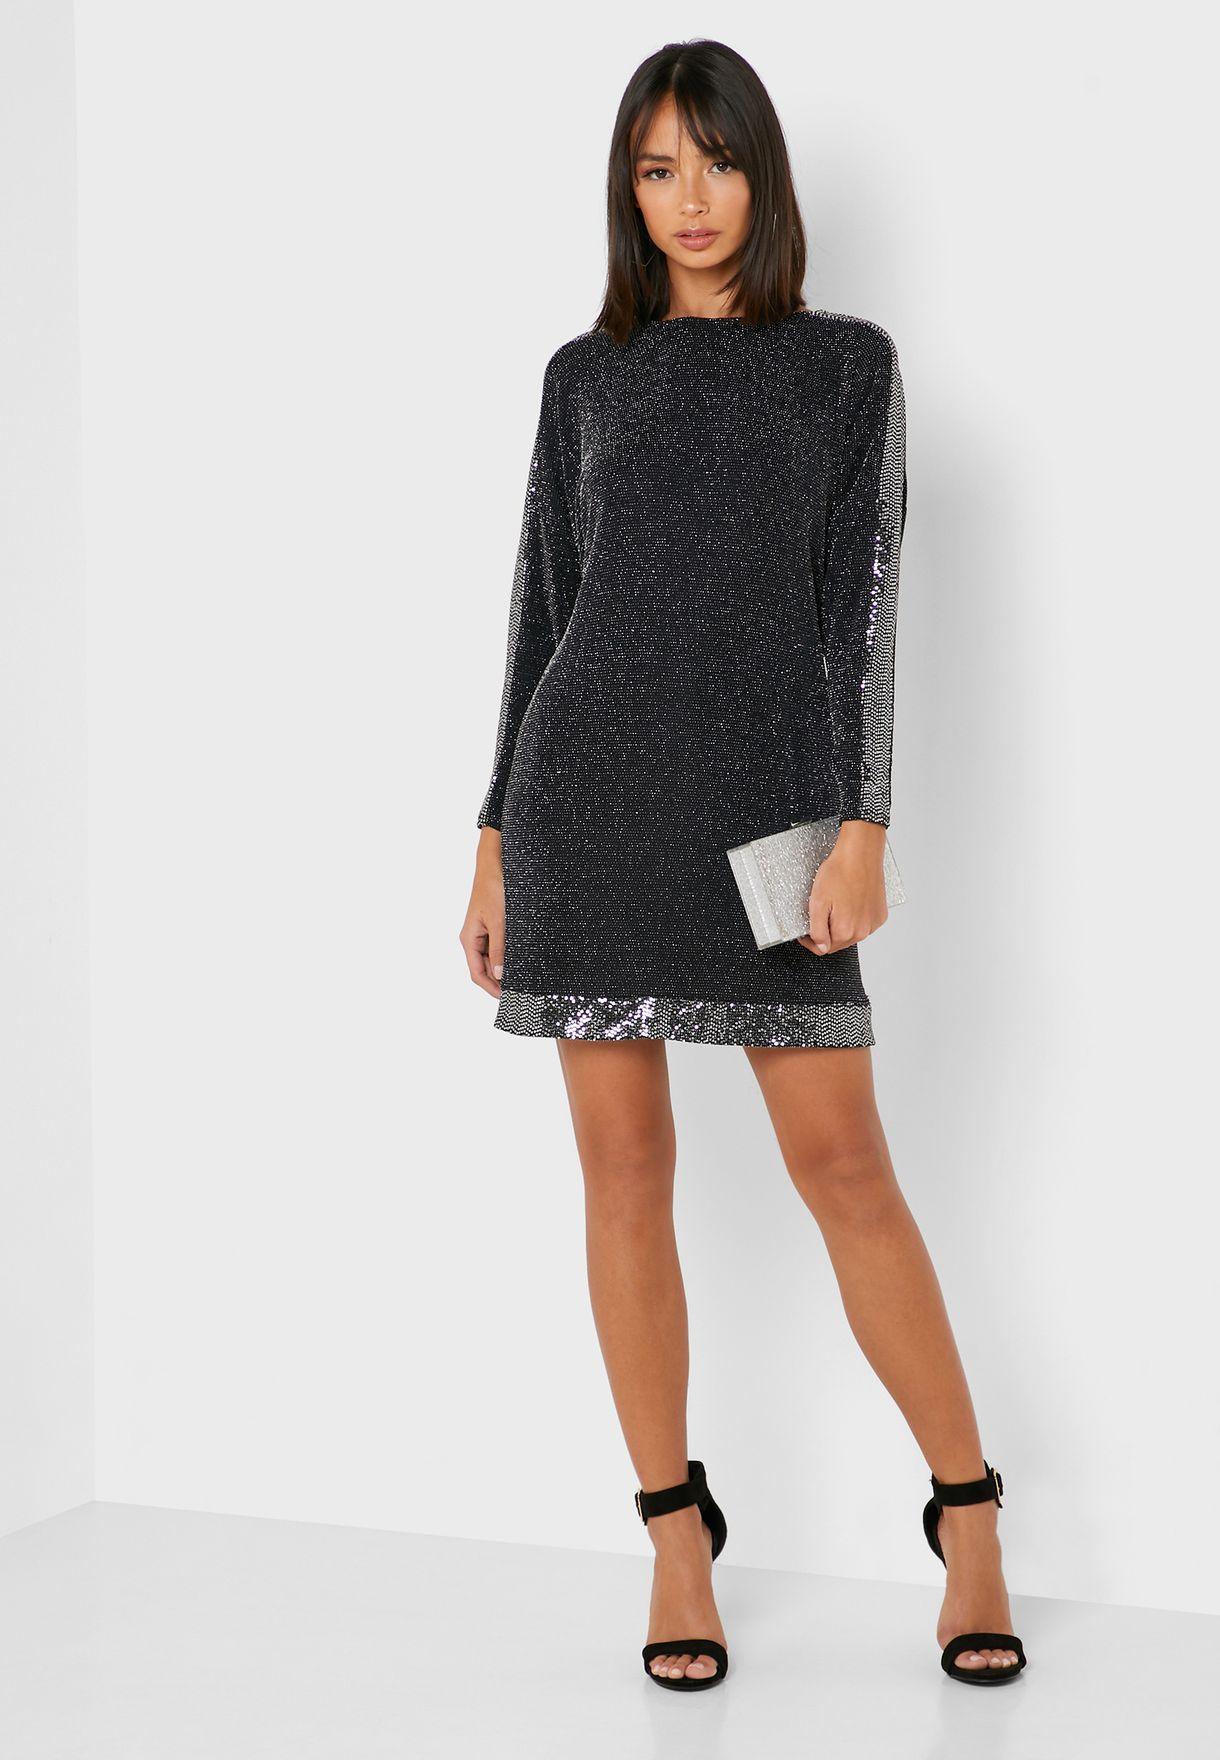 Sequin Trim Batwing Sleeve Dress